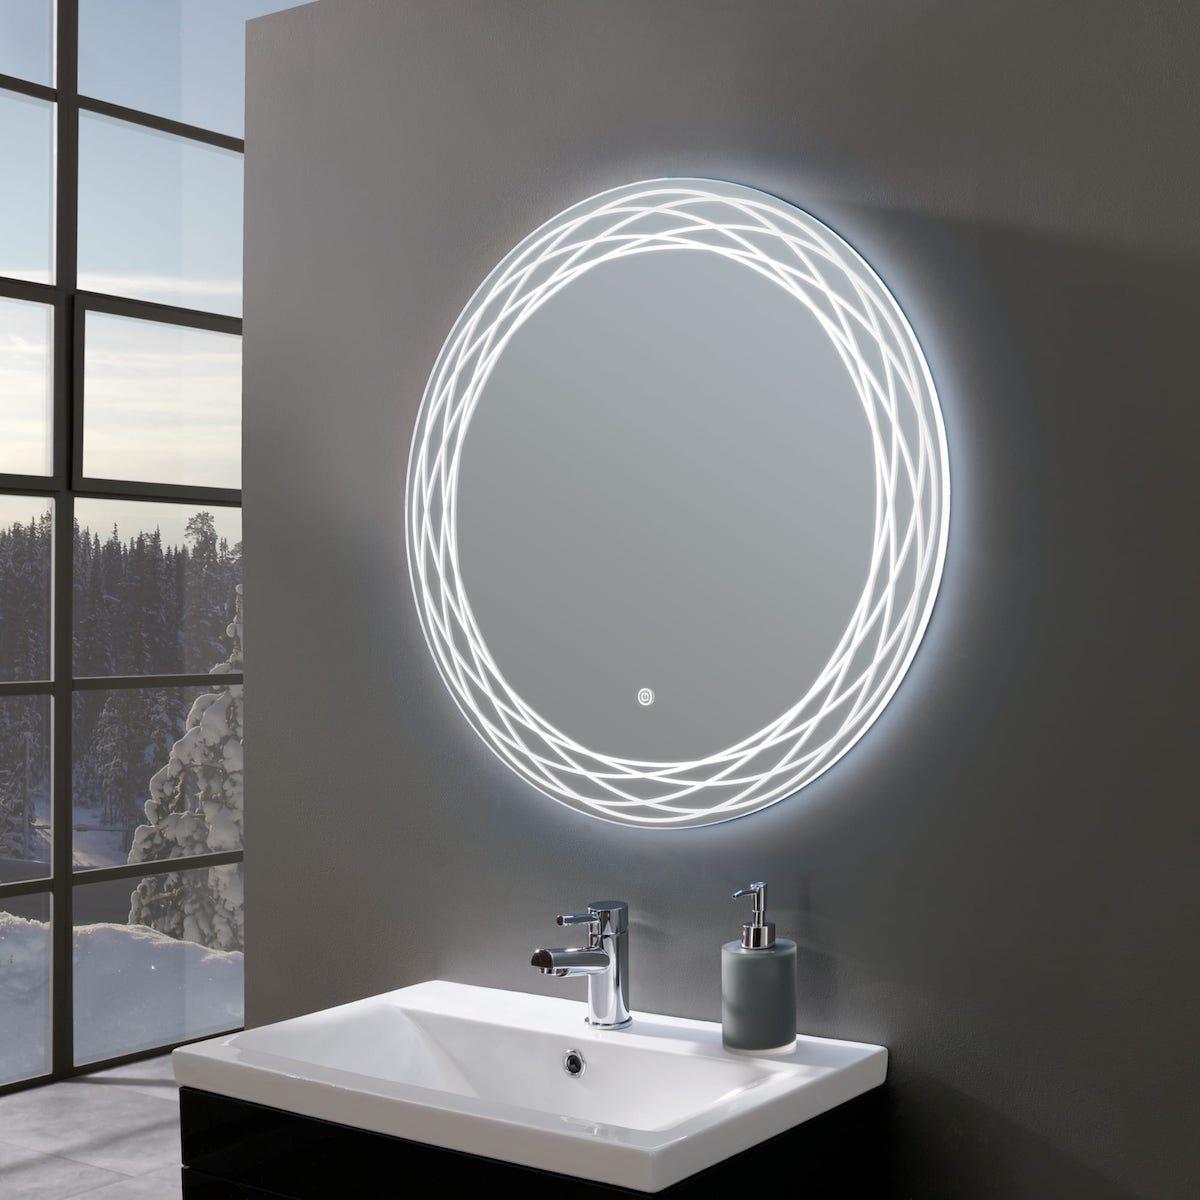 Ultra Slim Round Led Illuminated Mirror